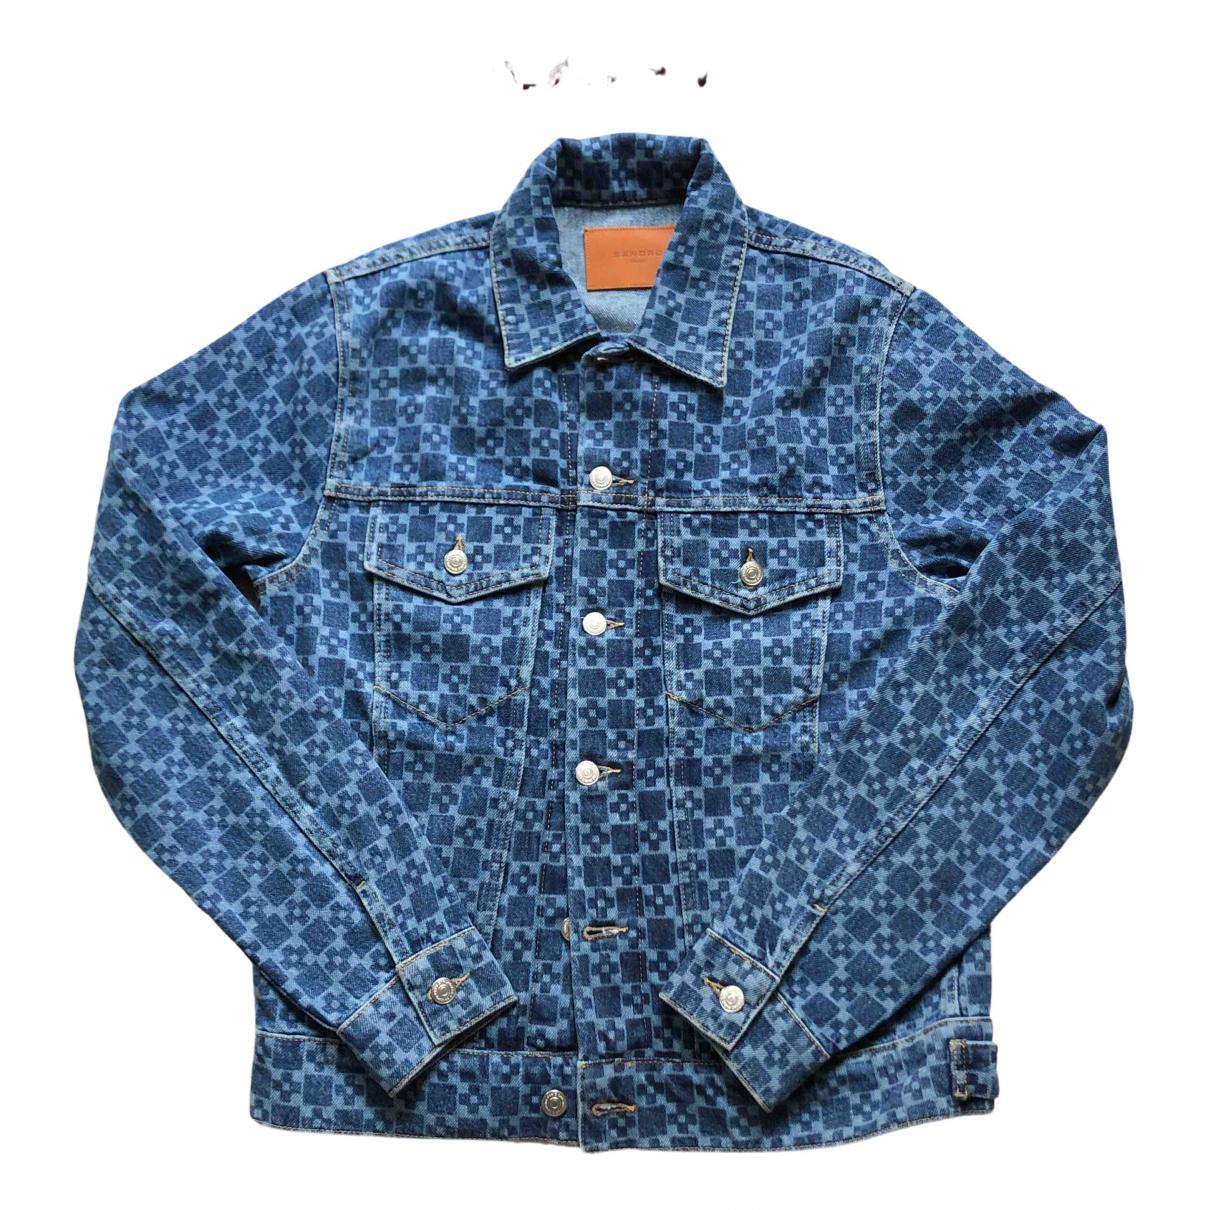 Sandro \N Jacke in  Blau Denim - Jeans